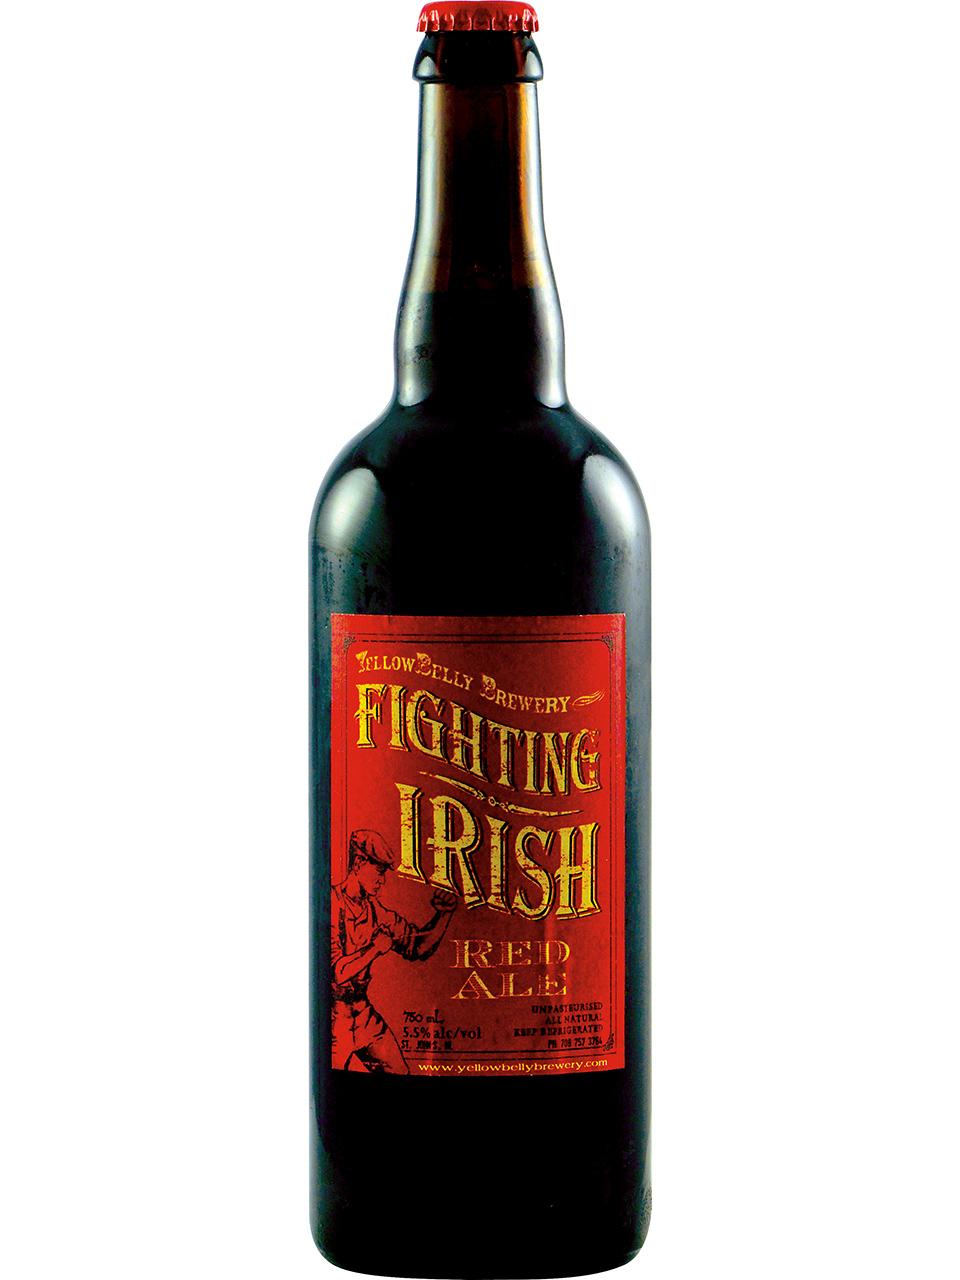 YellowBelly Fighting Irish Red Ale 750ml Bottle